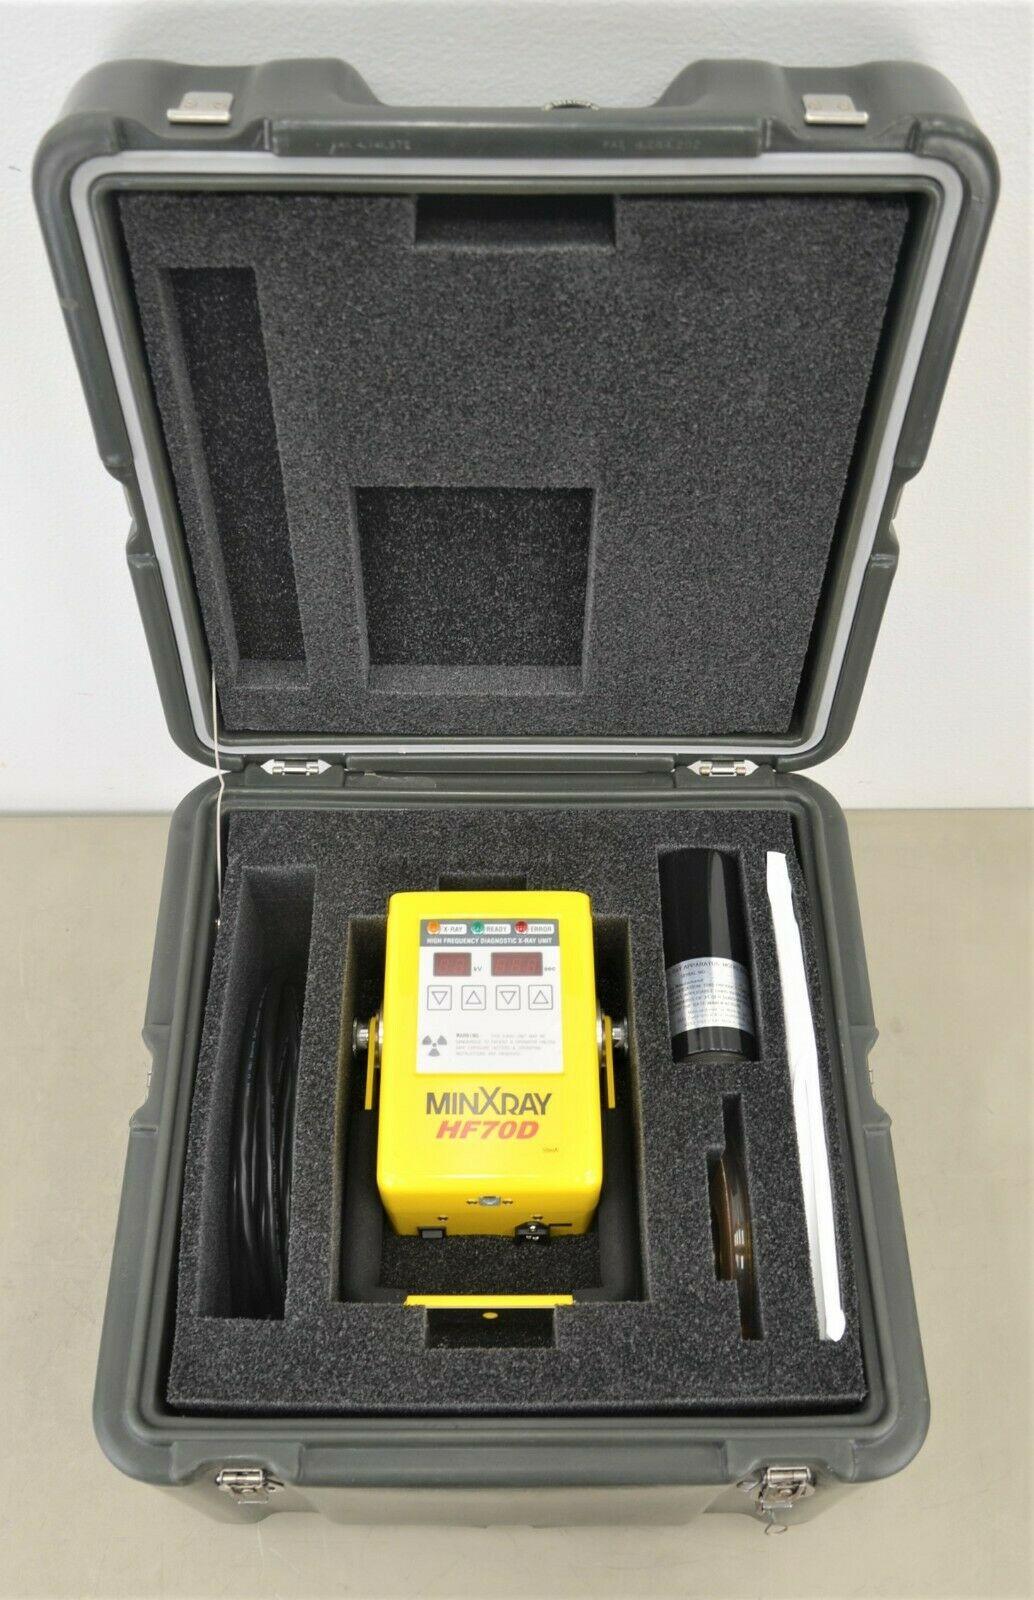 Toshiba Minxray Hf70dul Type A Portable Dental X Ray Unit